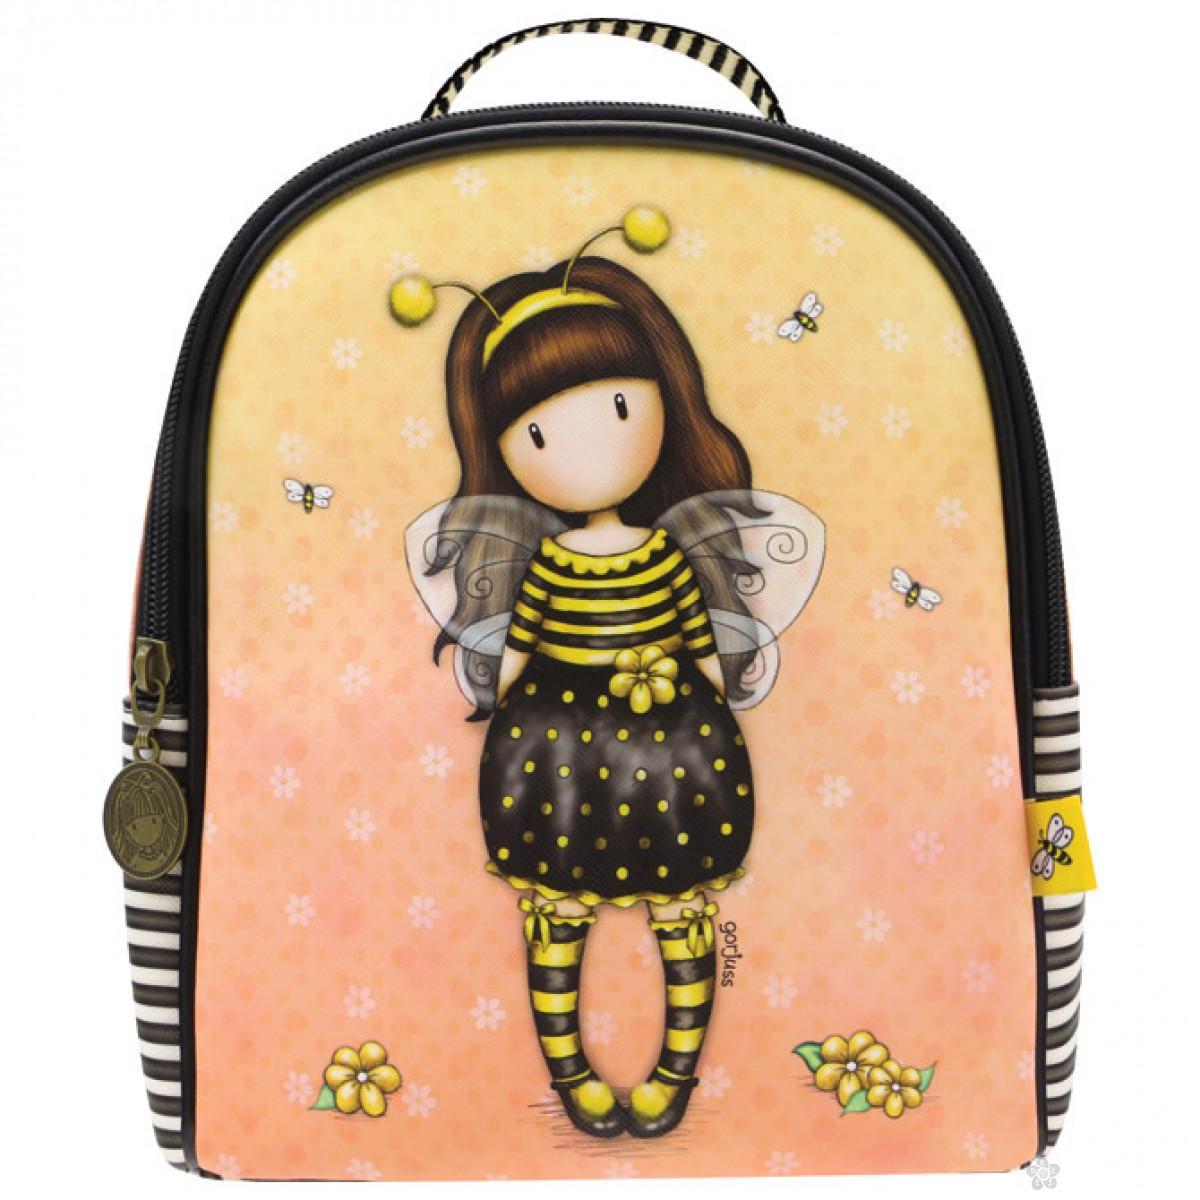 Gorjuss ranac za vrtić Just Bee-Cause, 904GJ01